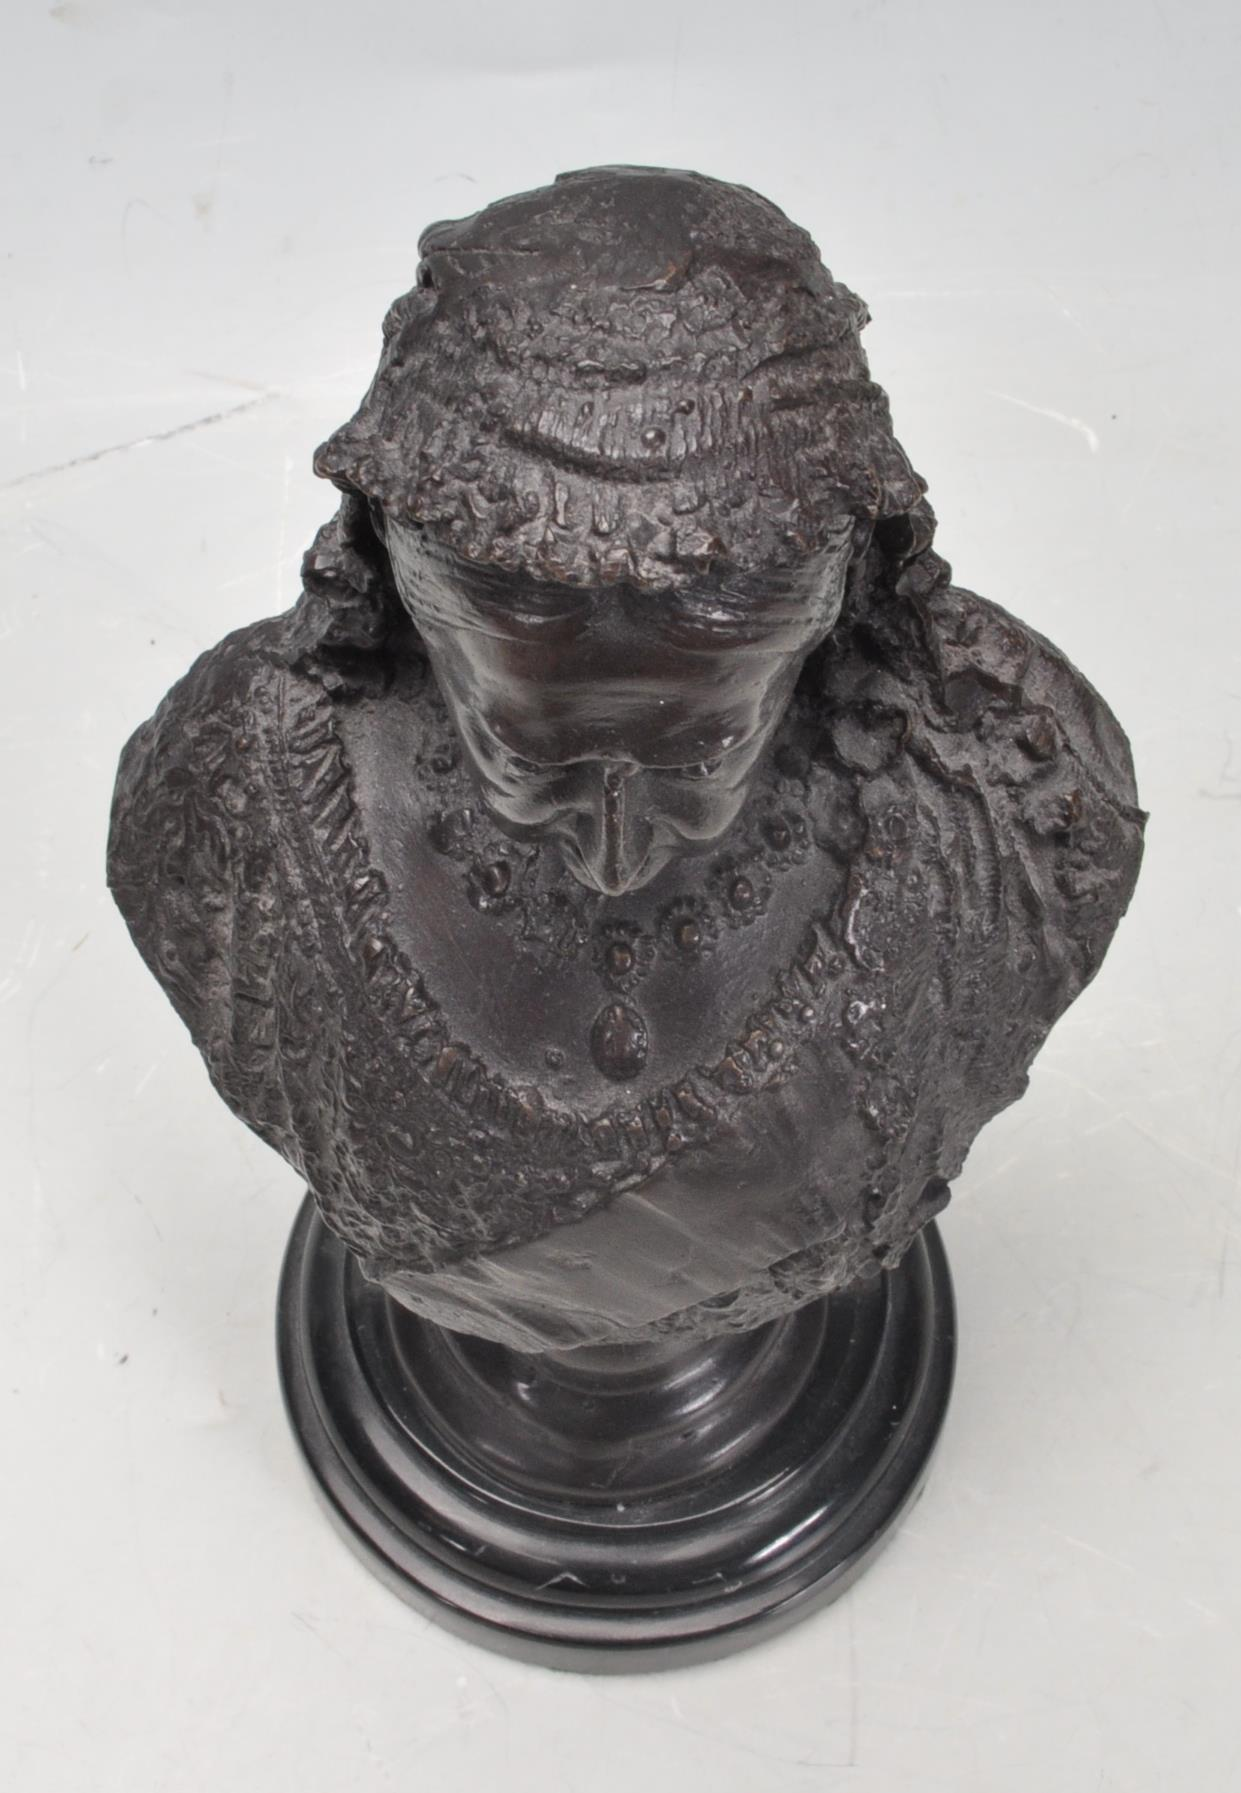 HER MAJESTY QUEEN VICTORIA BRONZE / BRASS BUST - Image 4 of 5